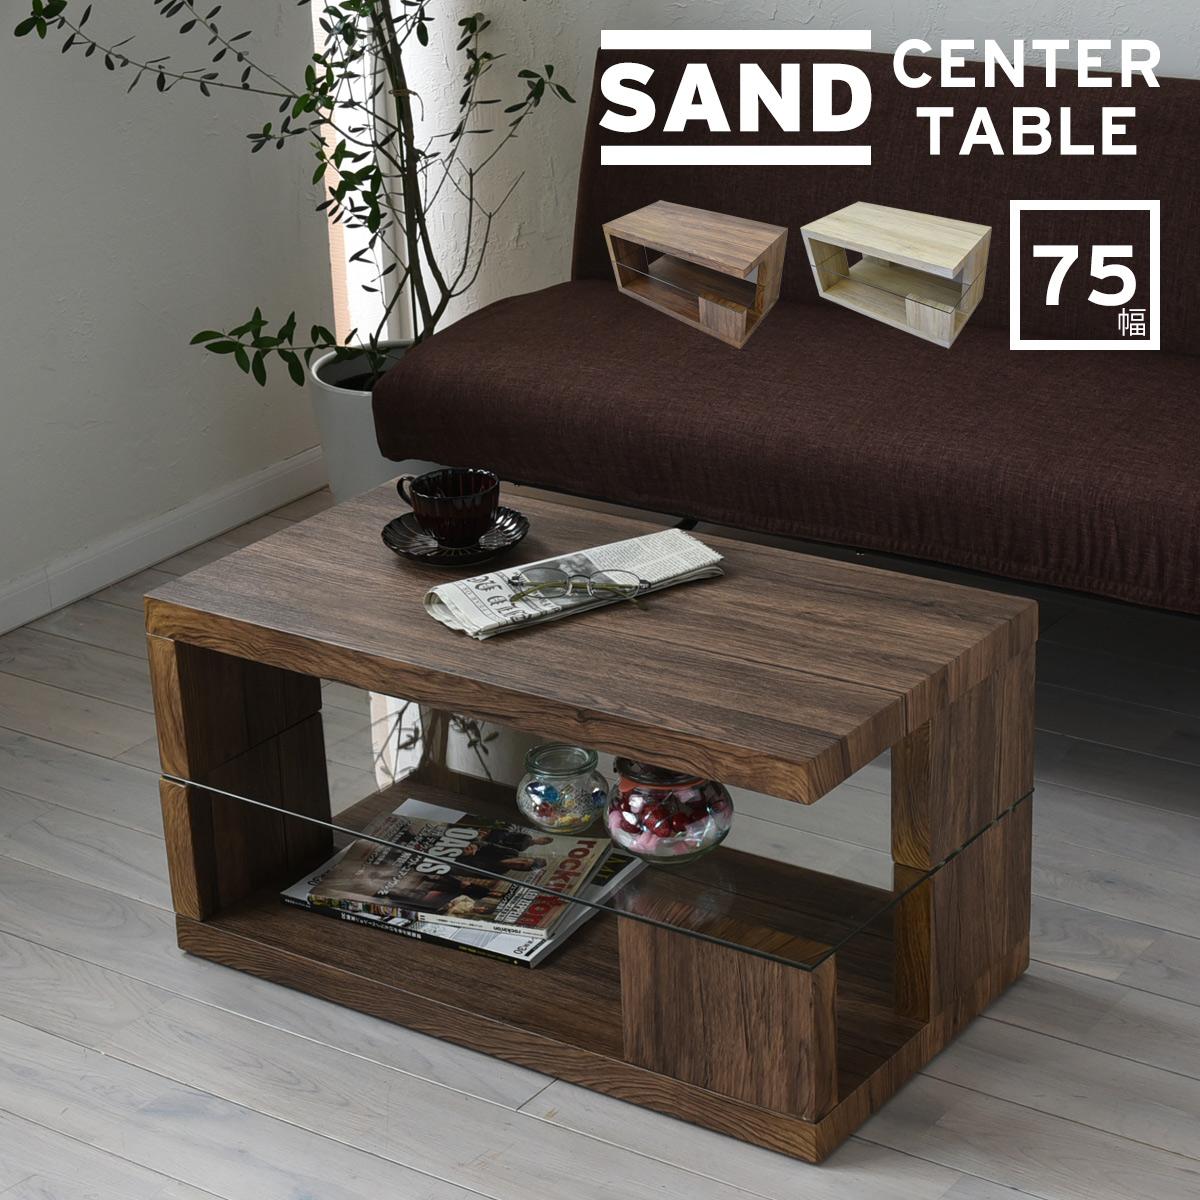 SAND センターテーブル SNCT-75 40mm厚 長方形 75×40 強化ガラス(5mm厚) ヴィンテージ調 古材風